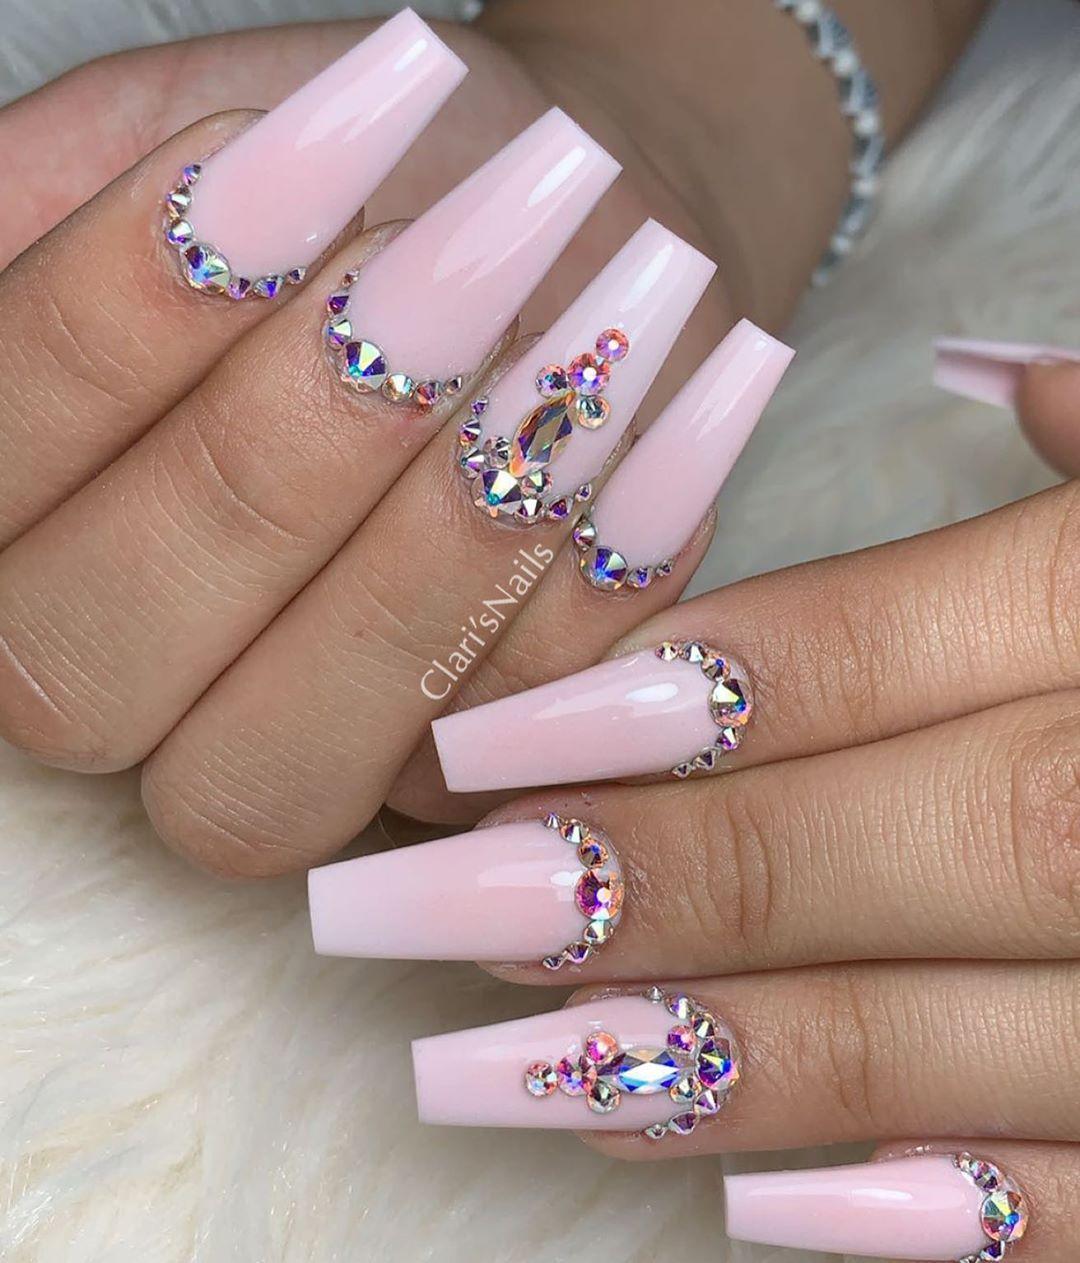 Skybeadsonline Swarovski Glamandglitsnails Clawaddicts Nailife Nails Pinknails Prettynail Baby Pink Nails Baby Pink Nails With Glitter Pink Bling Nails